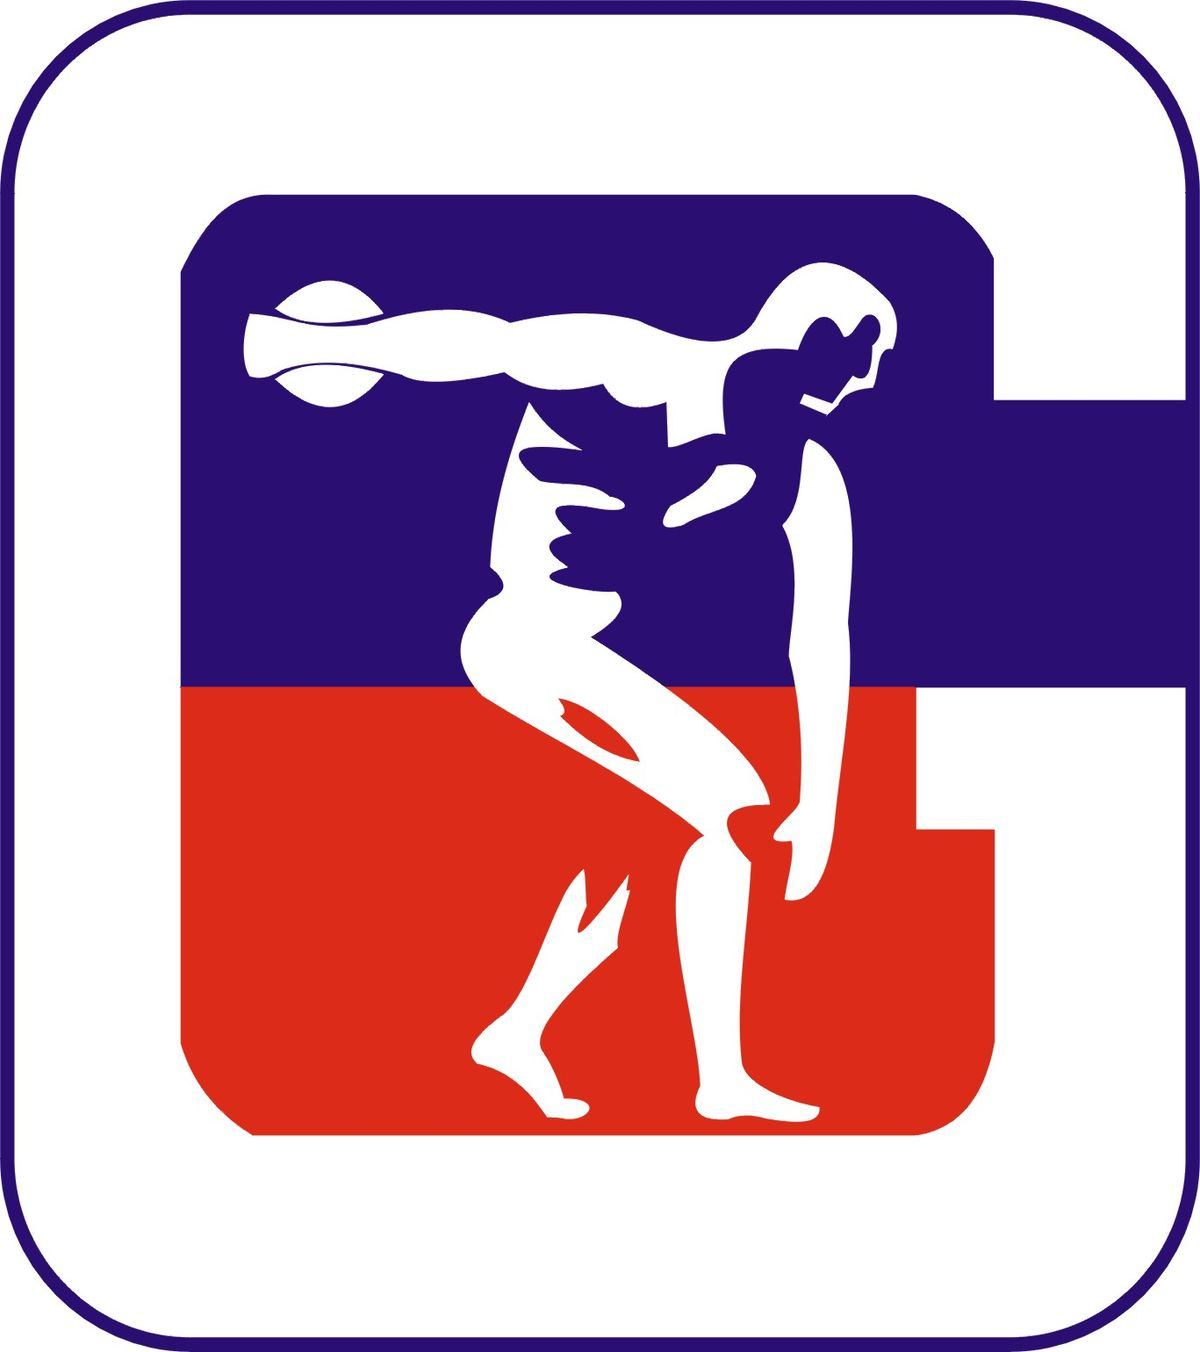 1200x1352 Logo Gymnasium Clipart